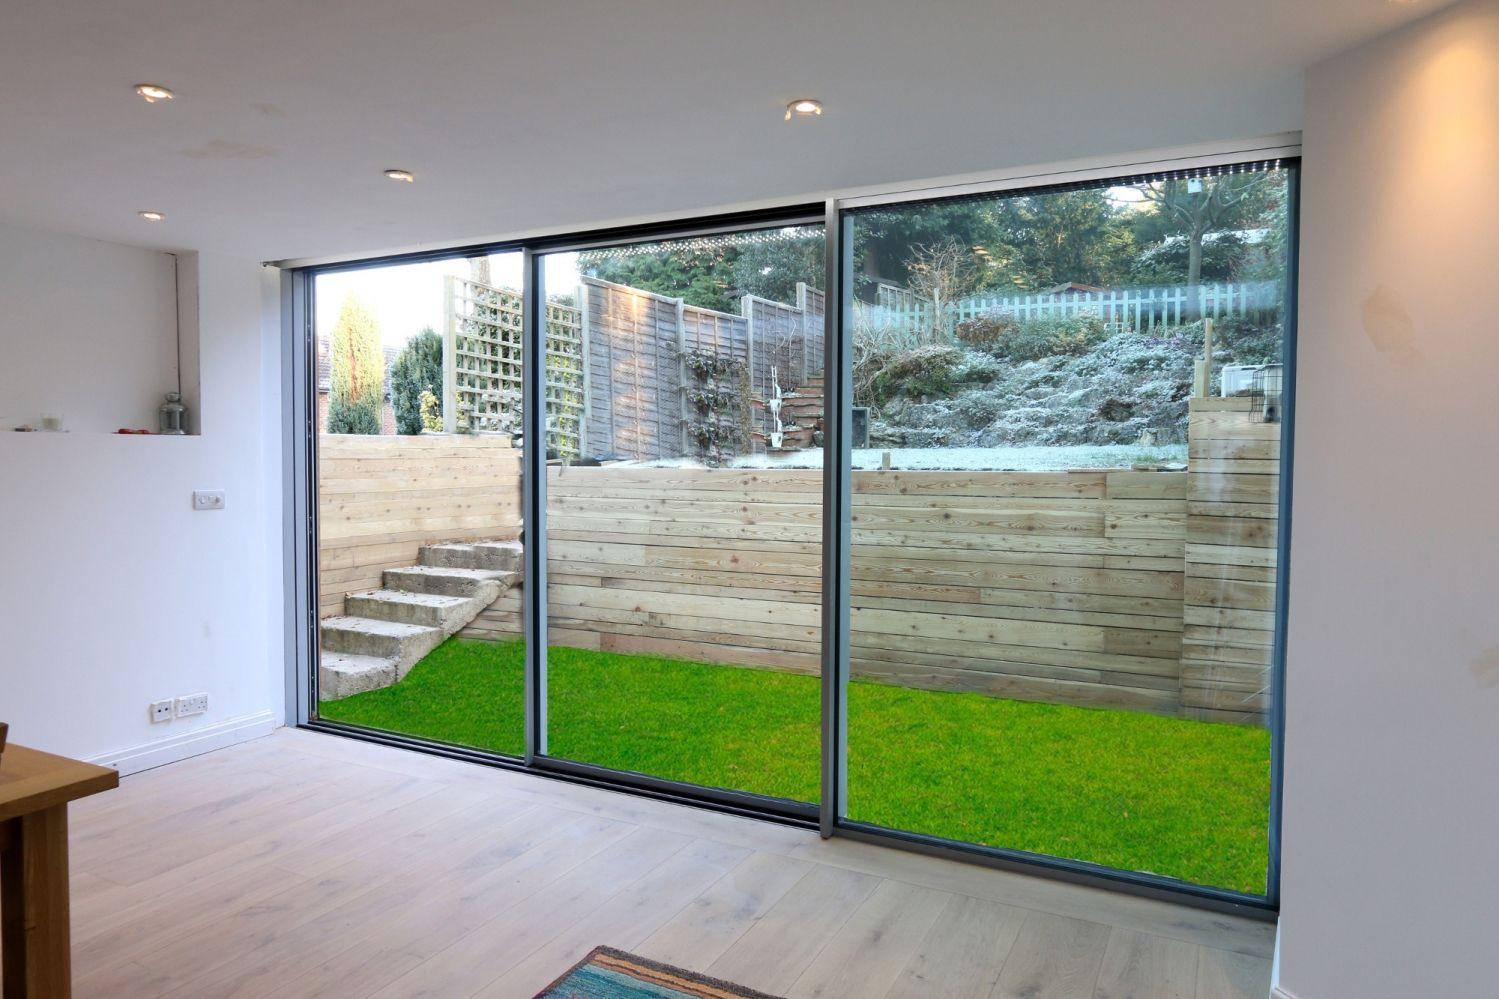 The sieger 30 sliding glass doors from hedgehog aluminium for Sliding glass door wall system